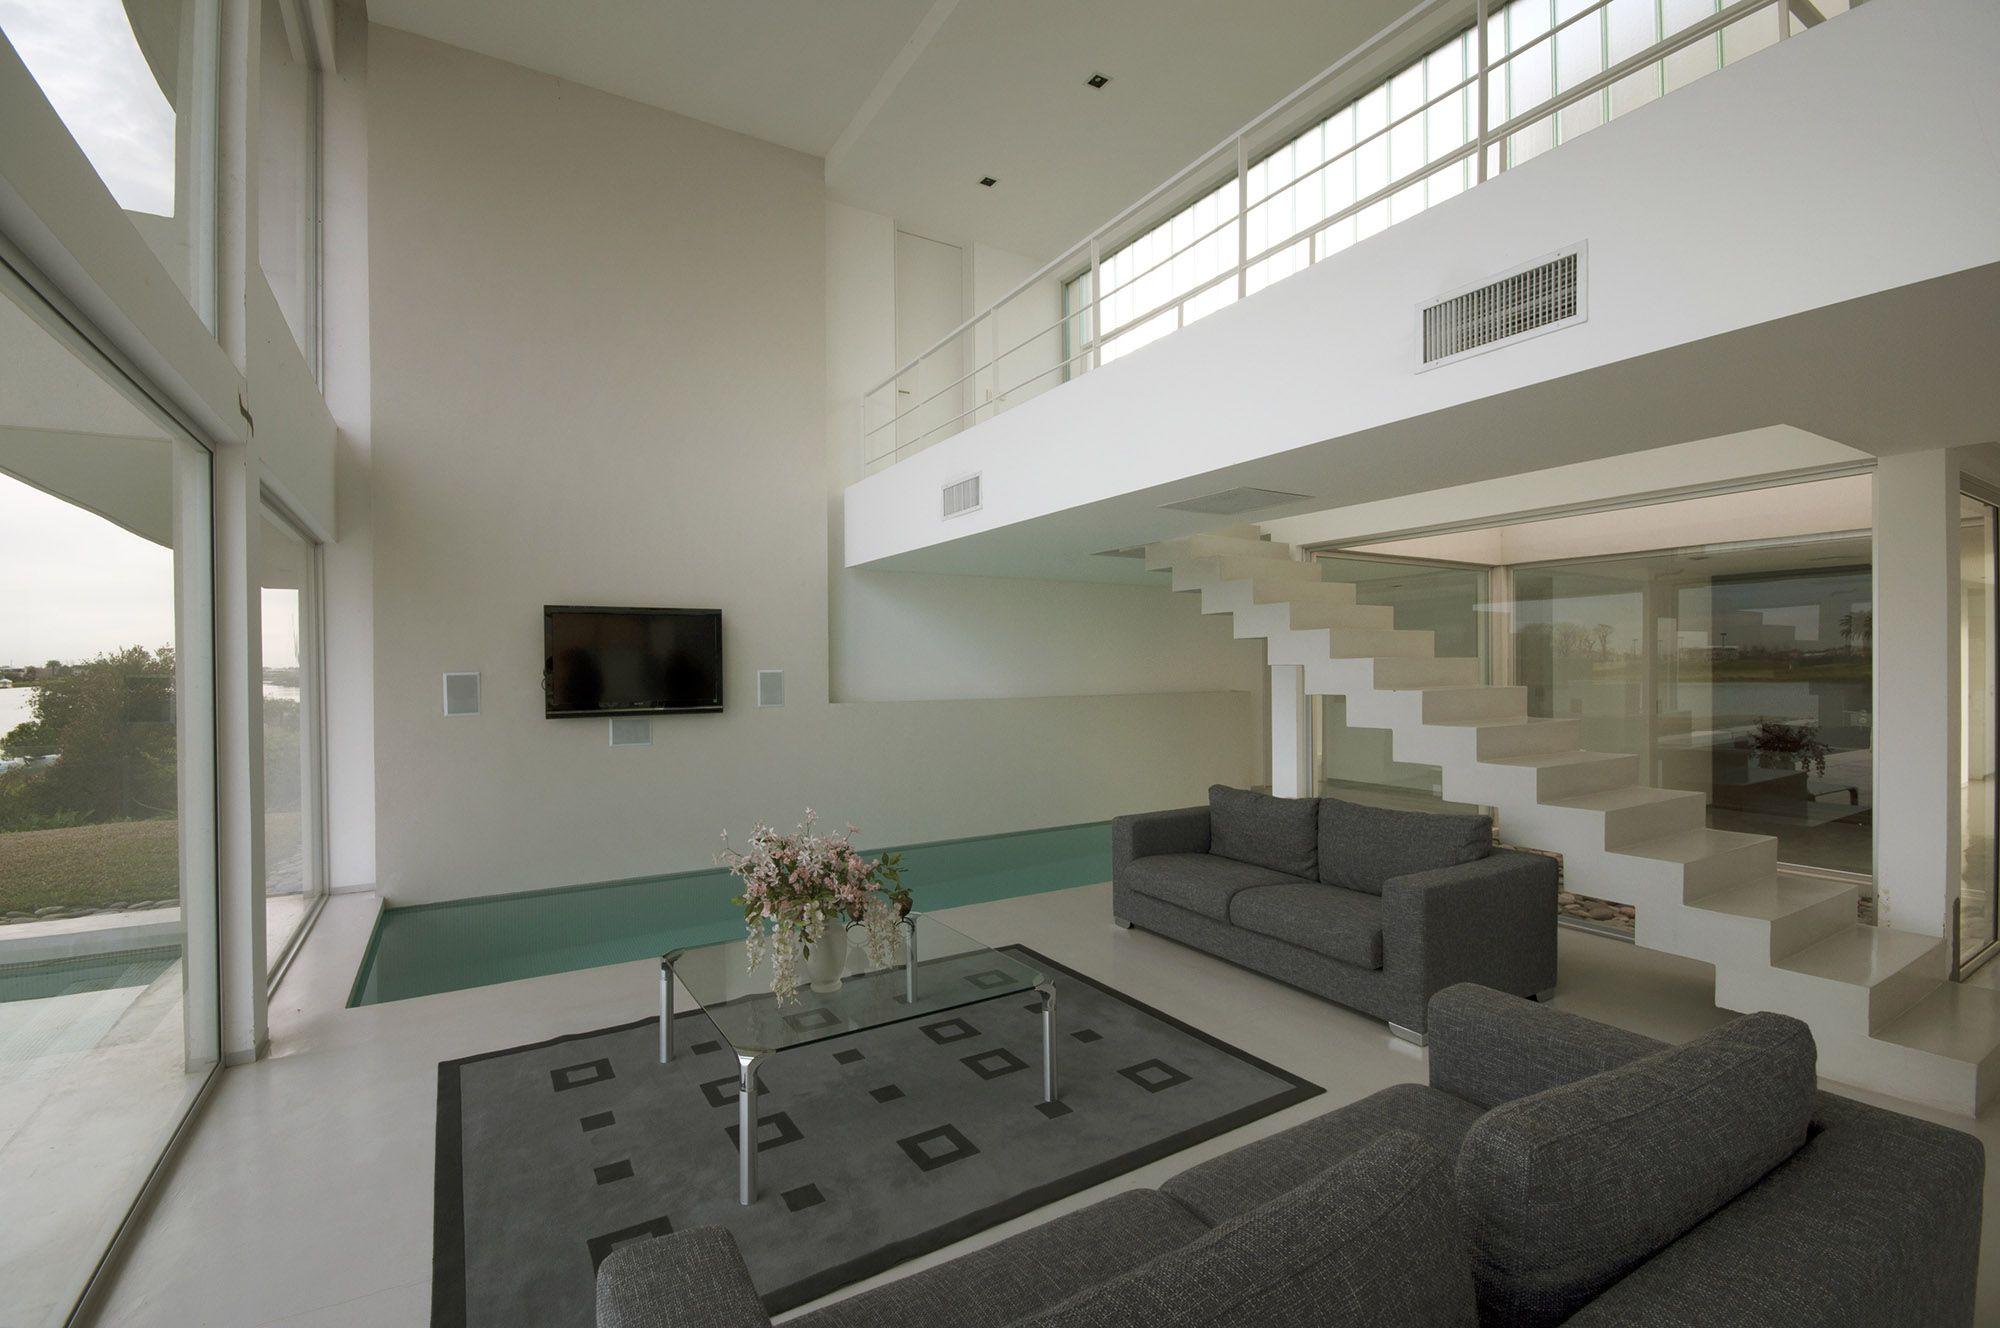 Pool House 19